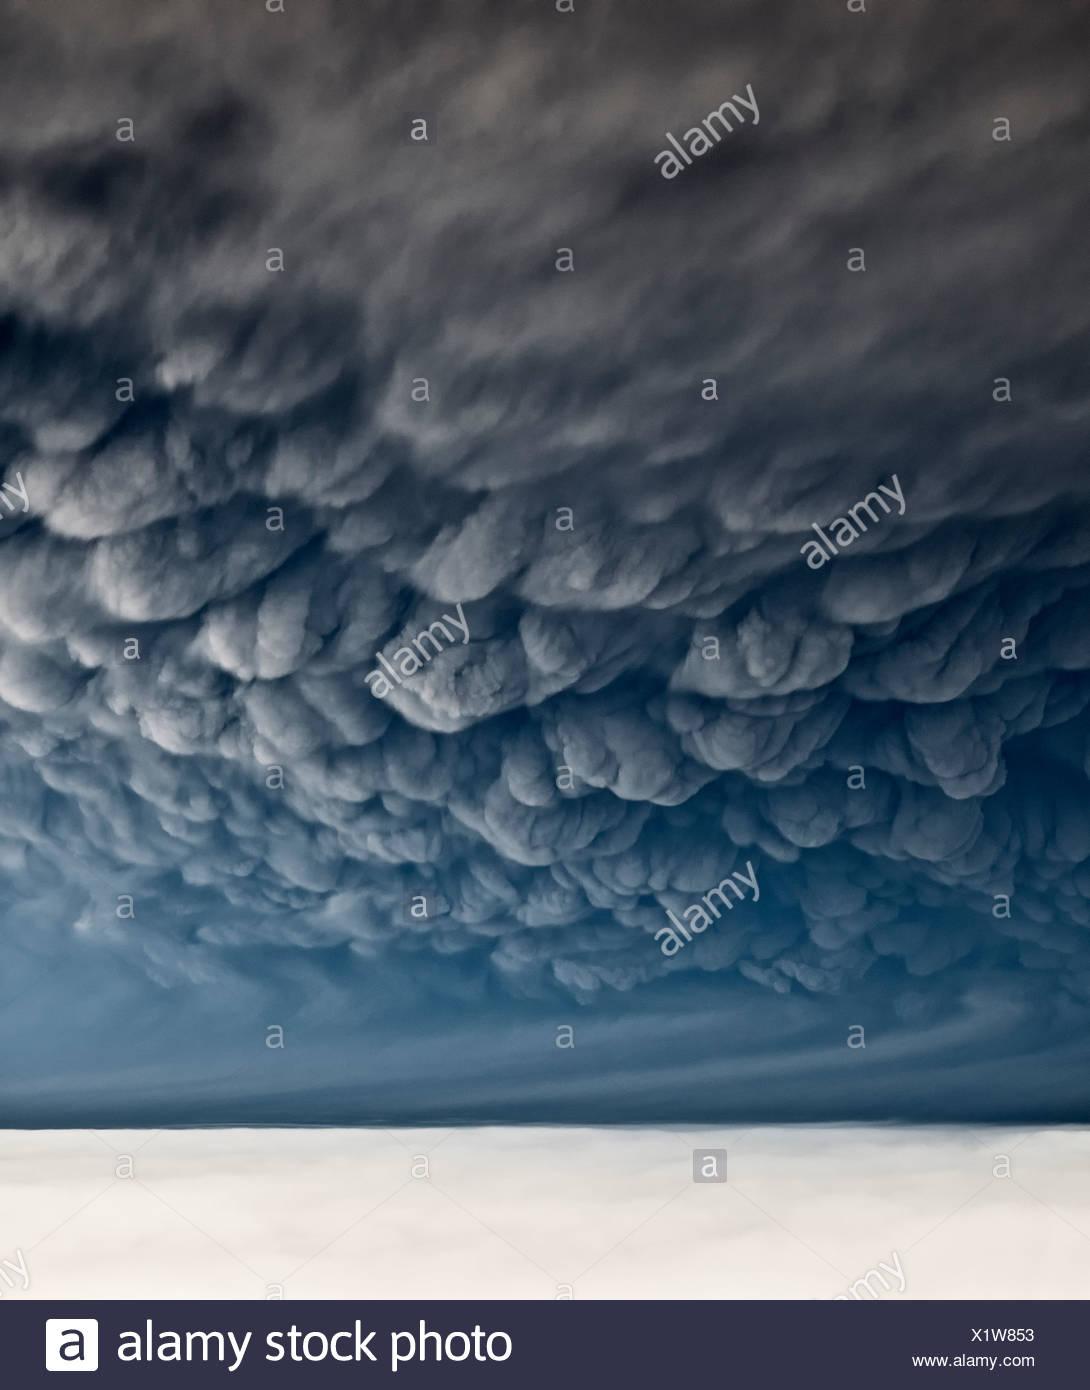 Under Grimsvotn Volcanic Eruption in the Vatnajokull Glacier, Iceland - Stock Image